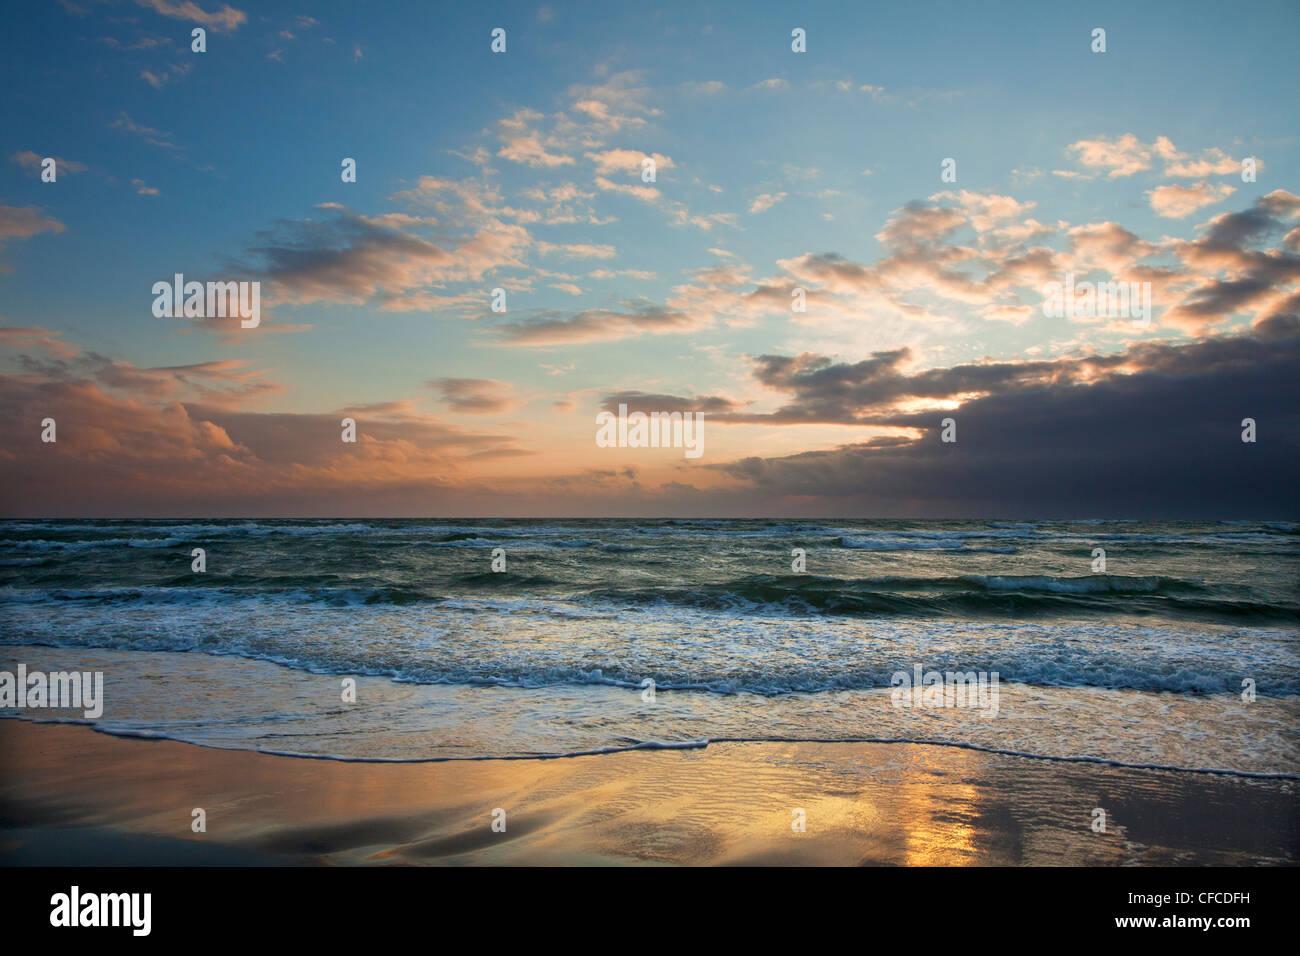 Darss playa oeste al anochecer, Fischland-Darss-Zingst, Mar Báltico, Mecklenburg-West Pomerania, Alemania Foto de stock